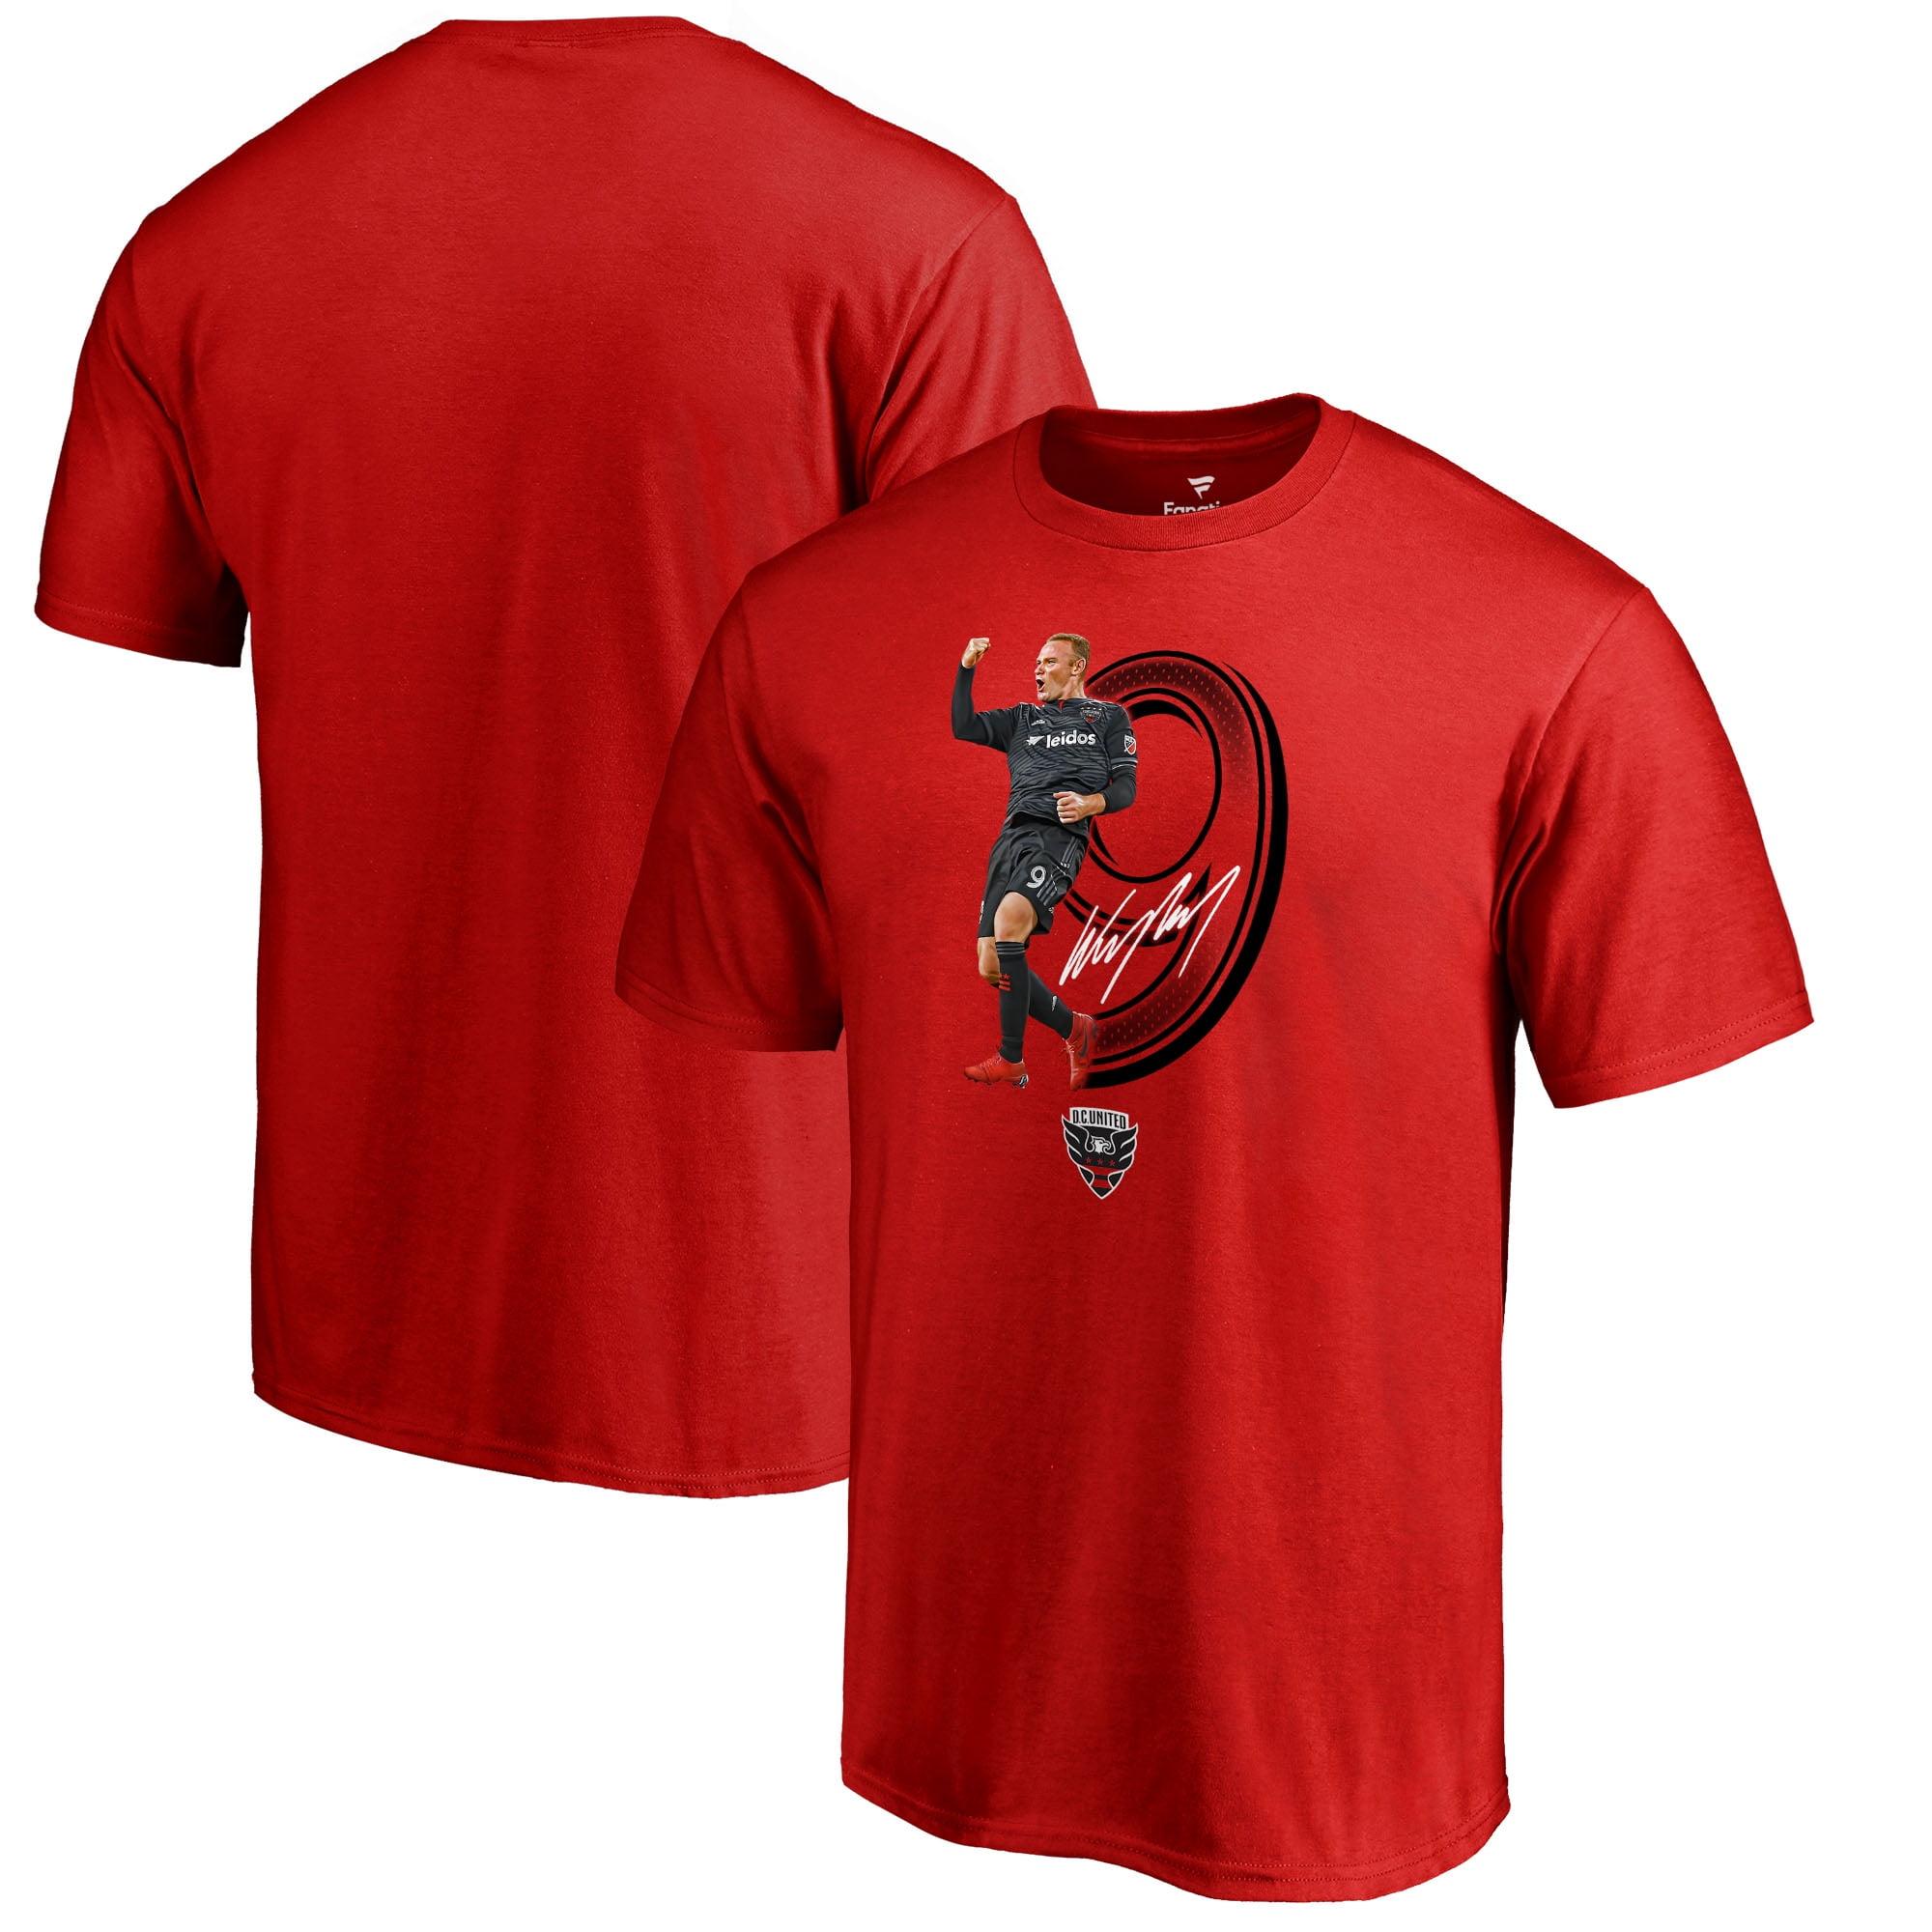 Wayne Rooney D.C. United Fanatics Branded Powerhouse Player T-Shirt - Red